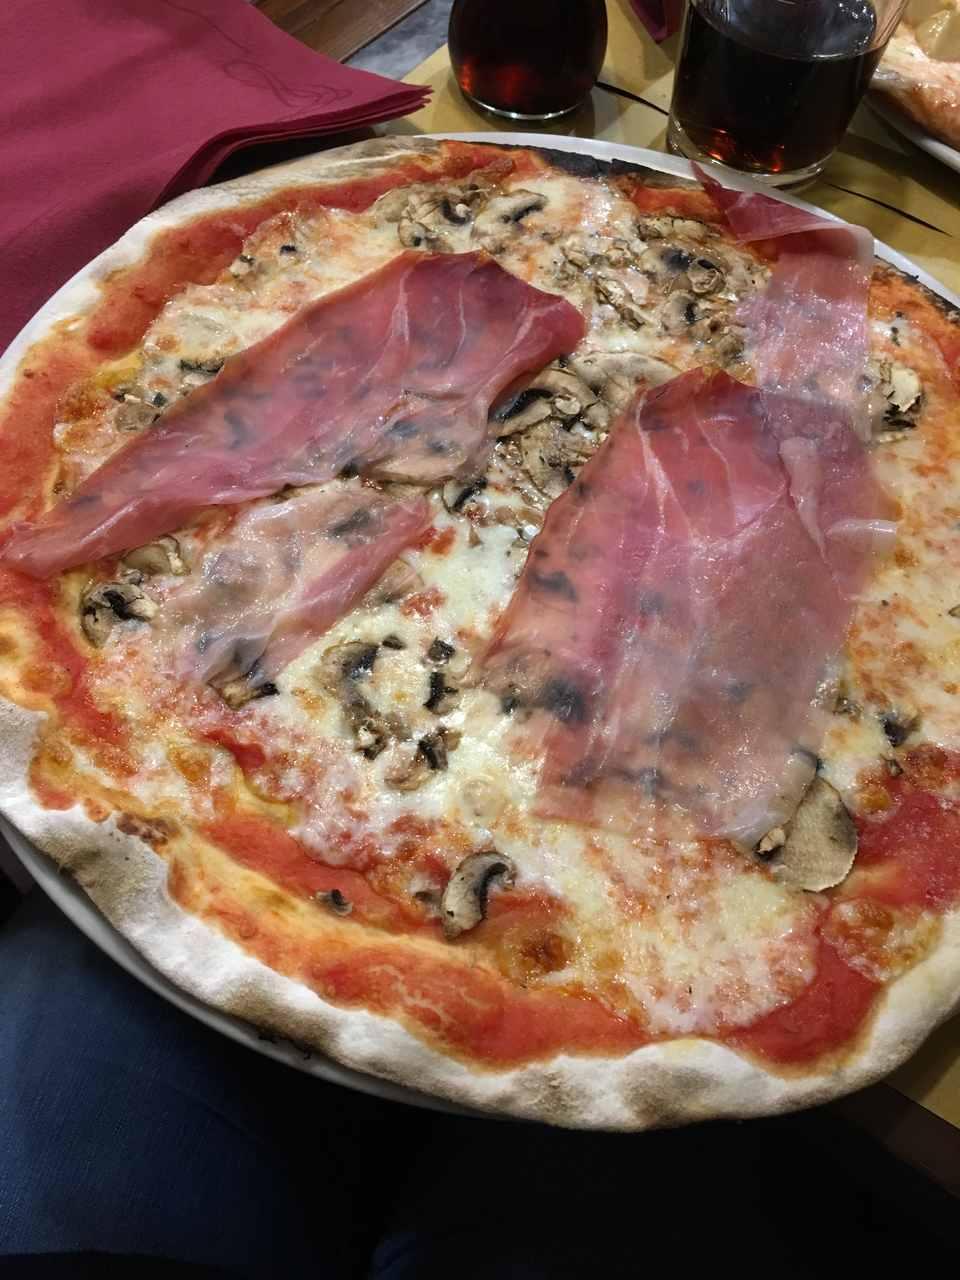 Pizza na Navona Notte em Roma. Foto de Inês Marques